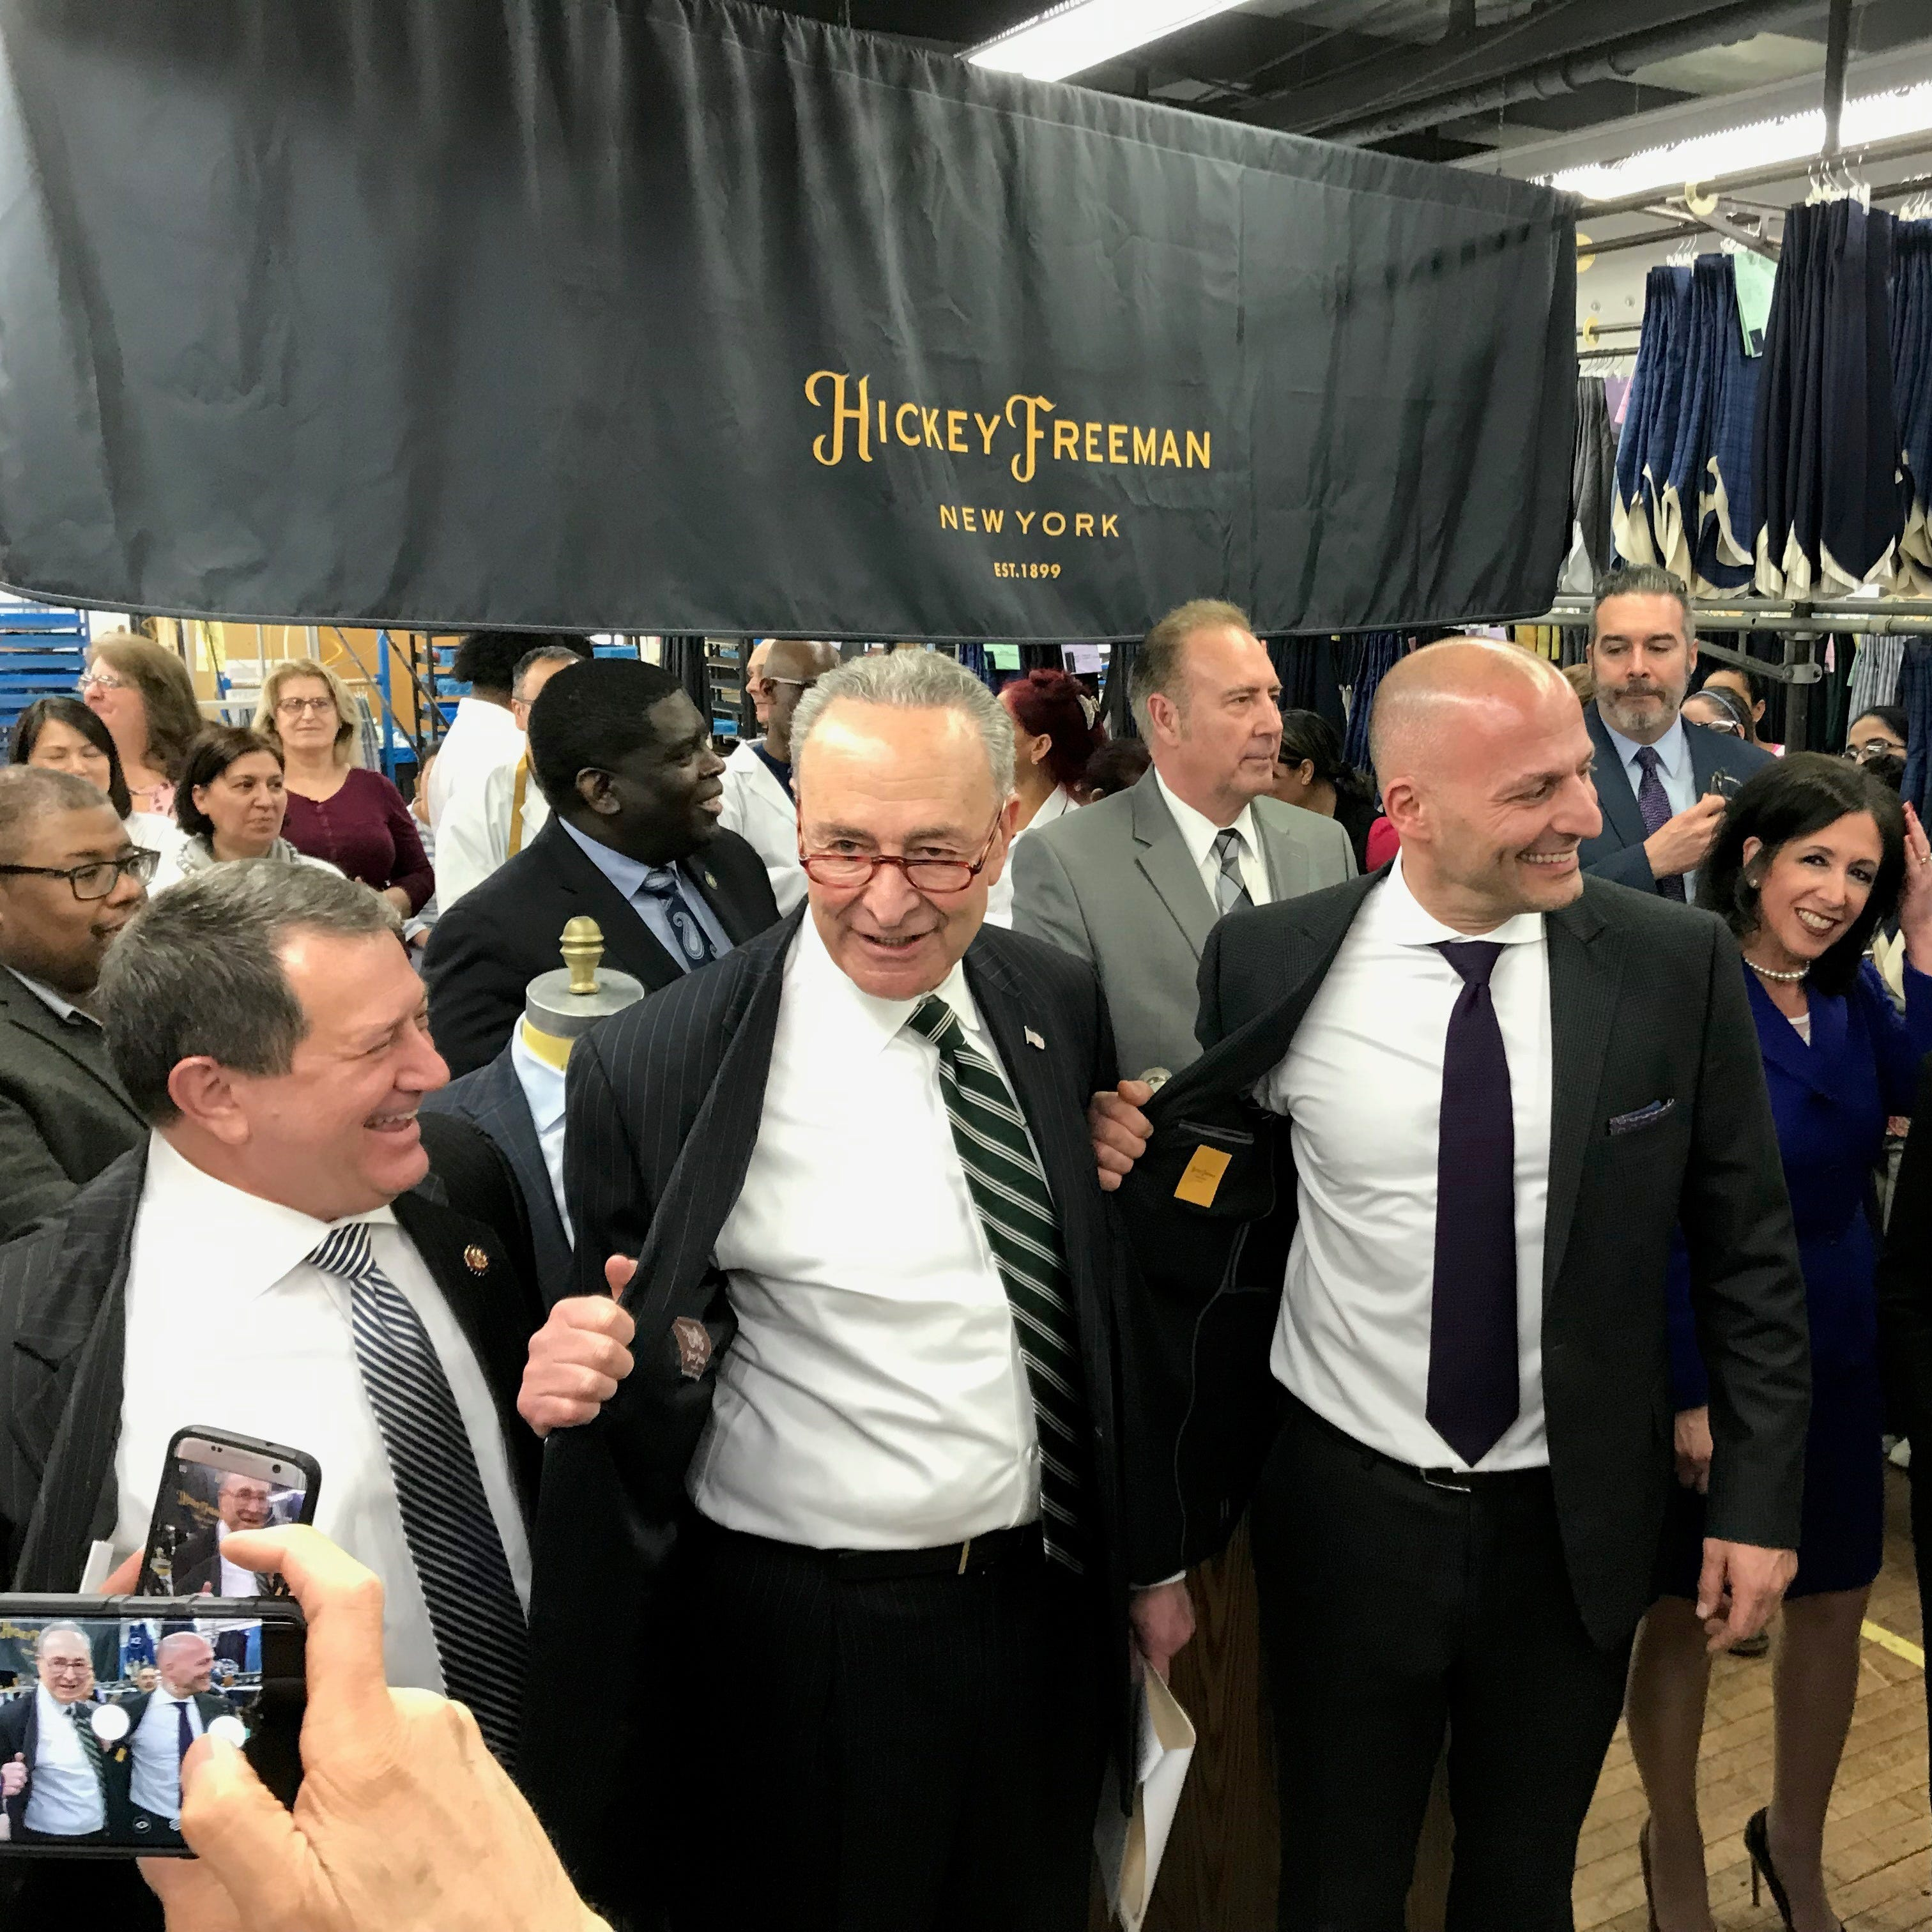 Hickey Freeman to invest $8M, create 80 jobs